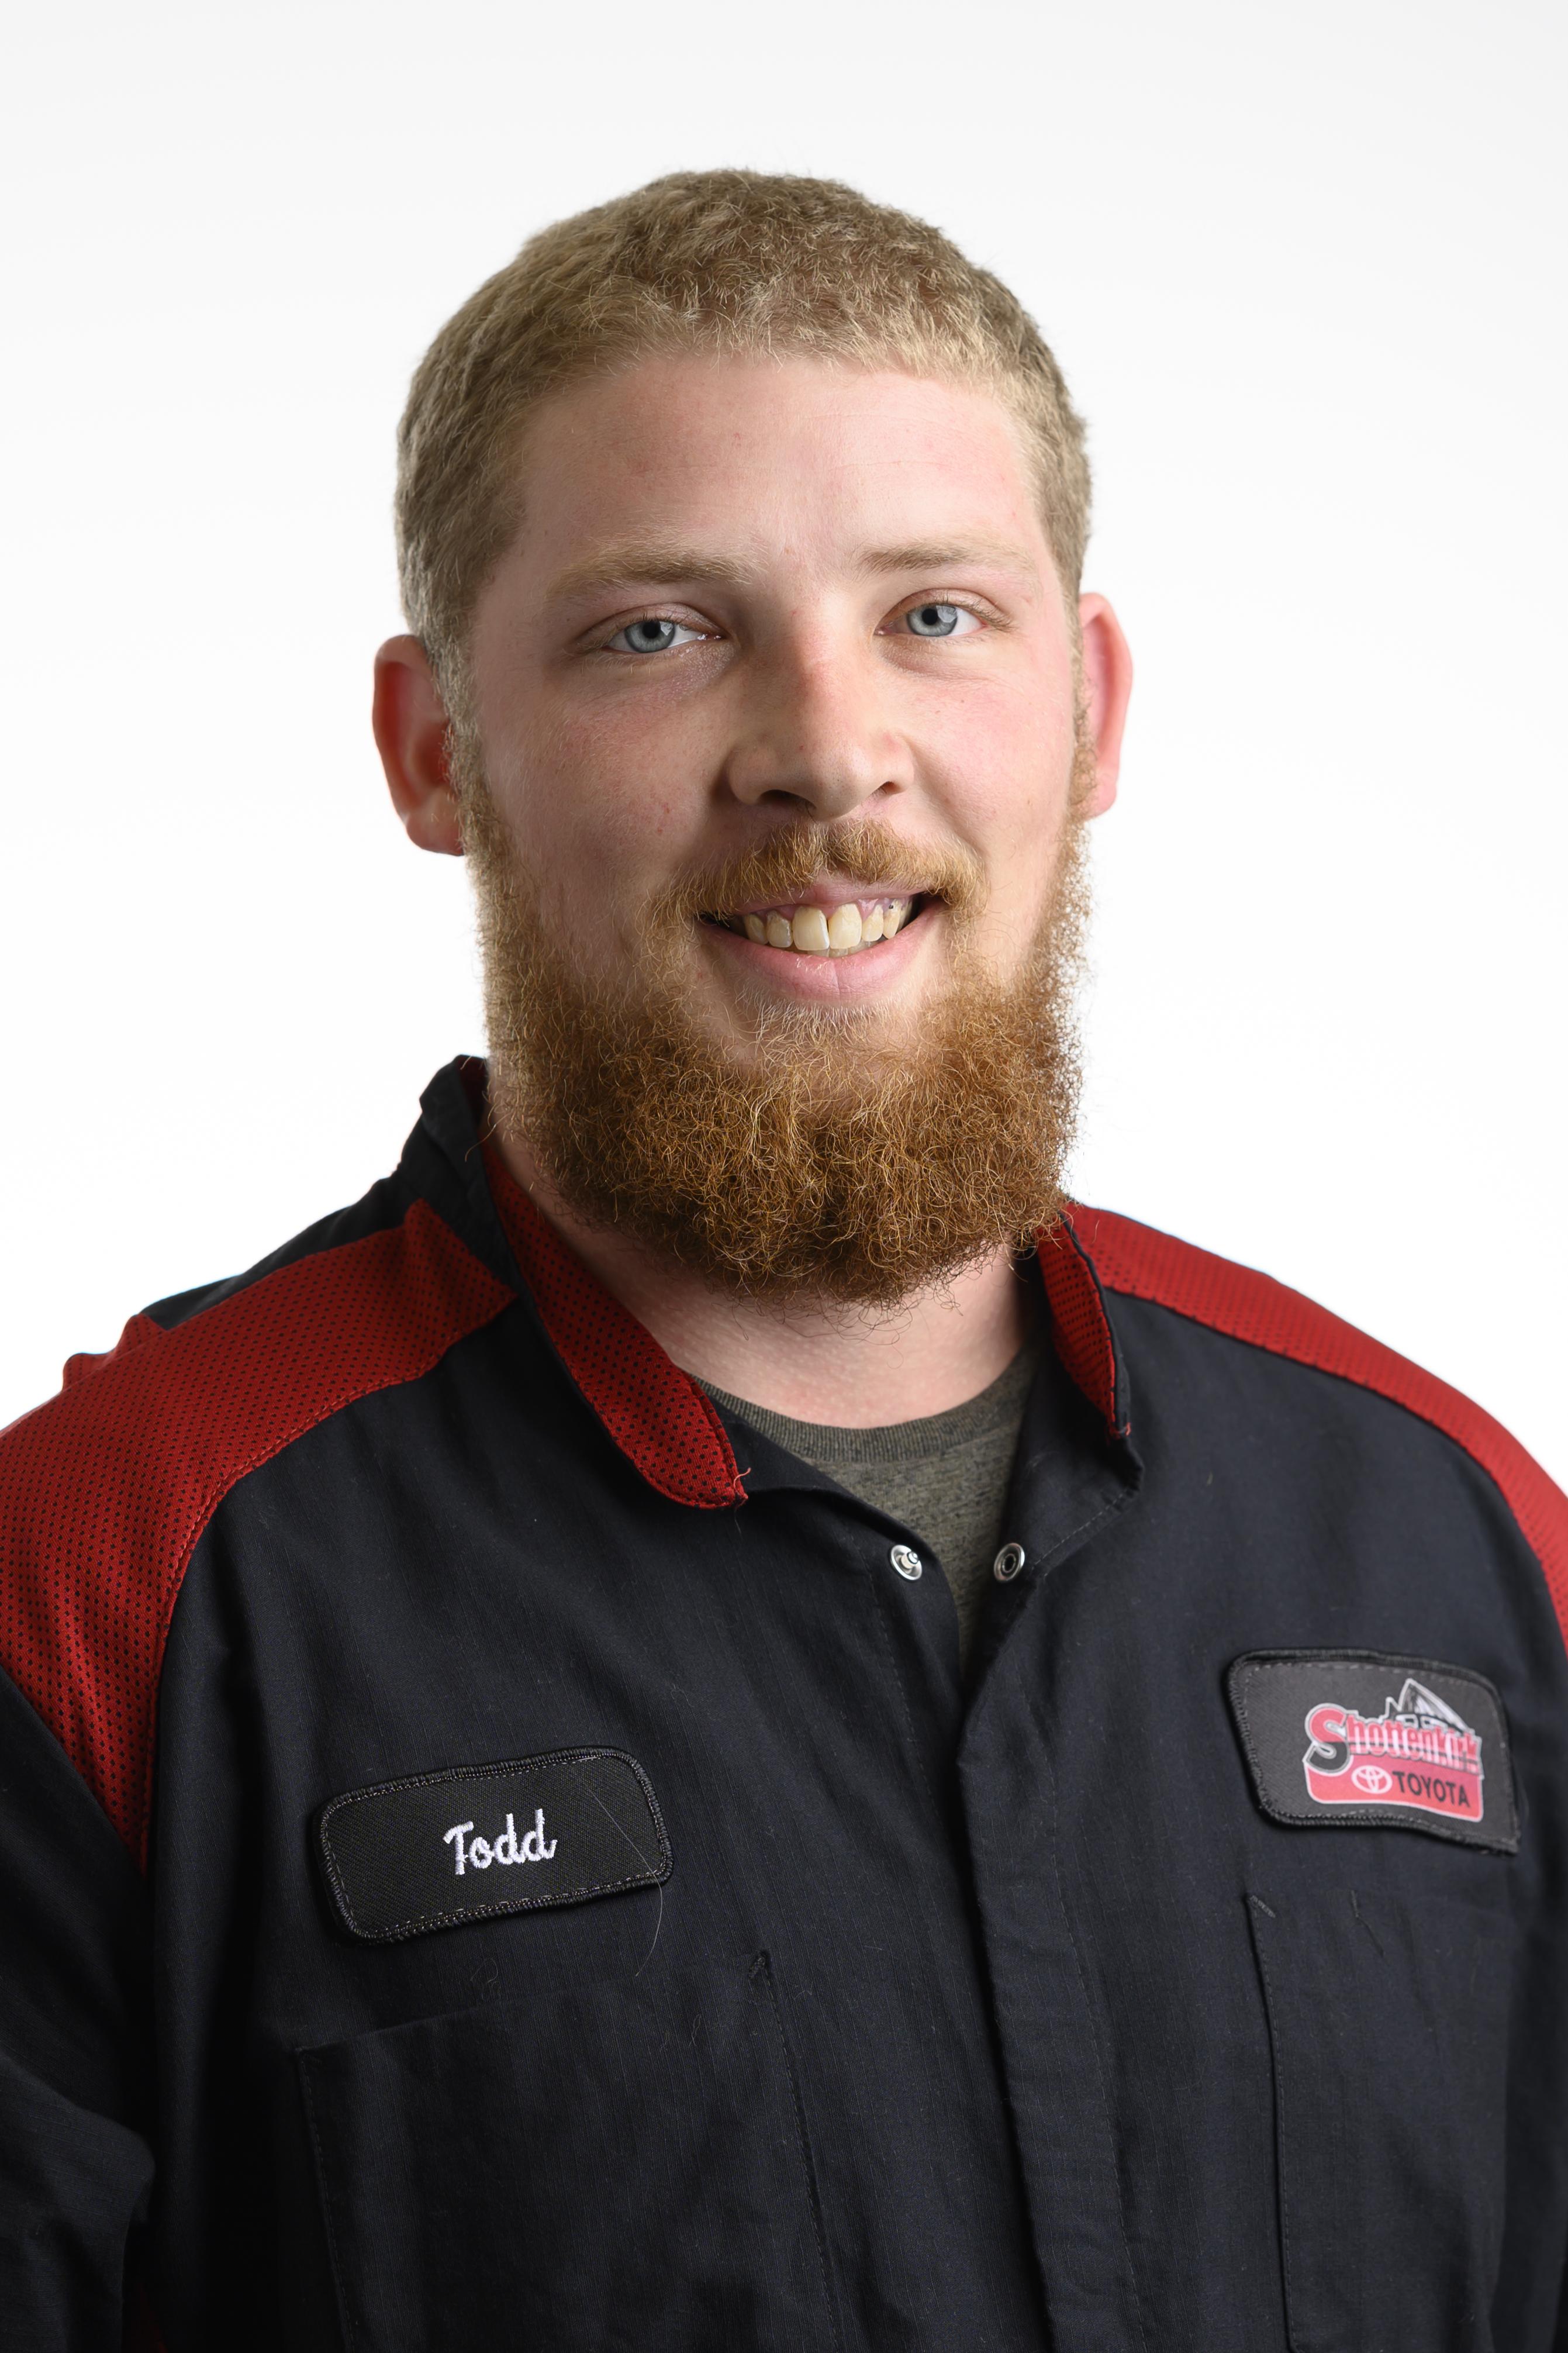 Todd  Hendrickson Bio Image